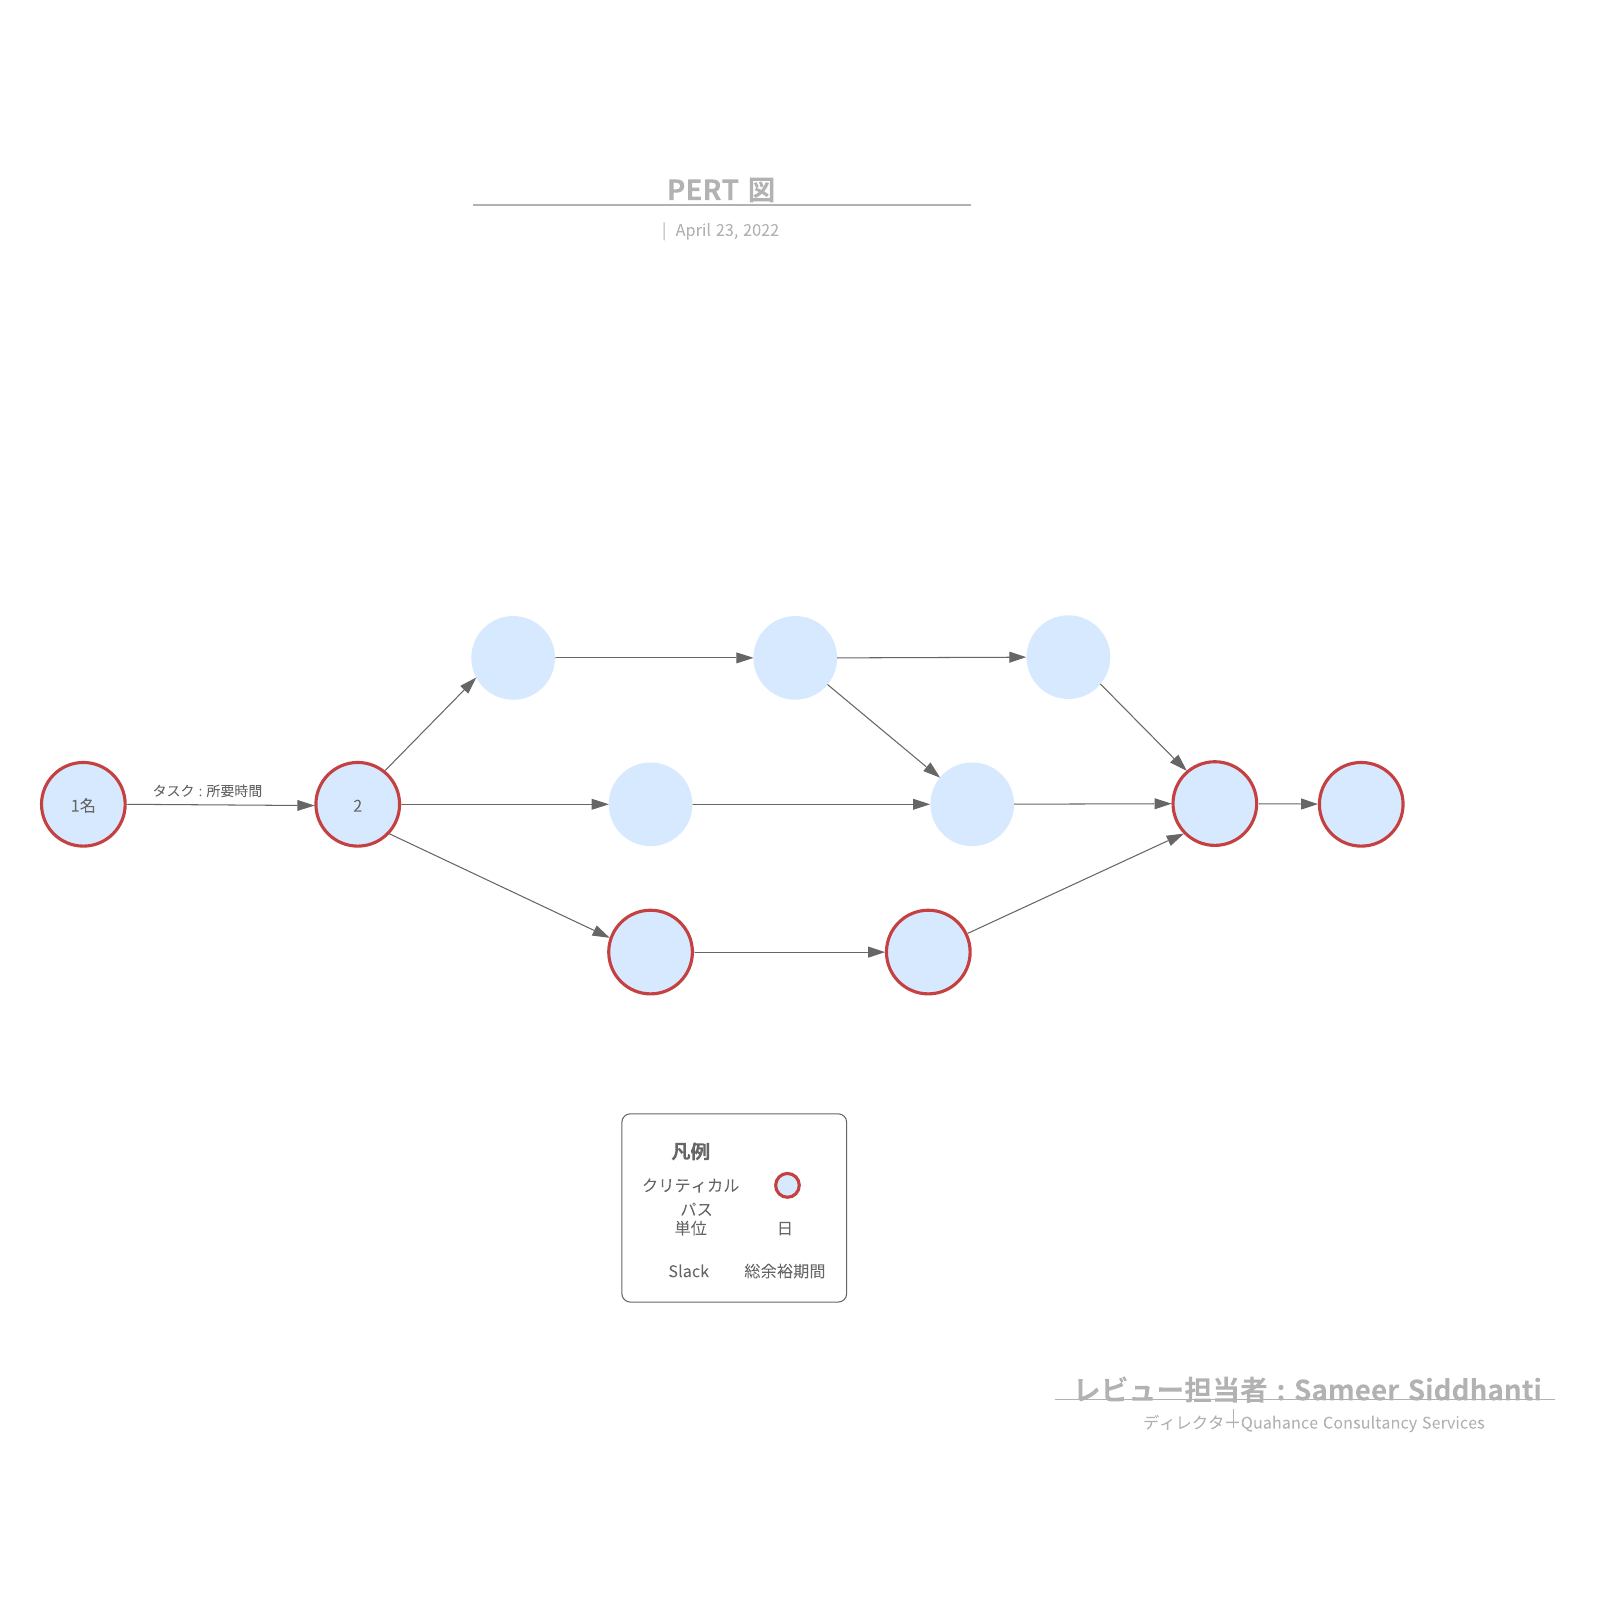 Program Evaluation and Review Techniques (PERT)図とパート法をテンプレートで解説